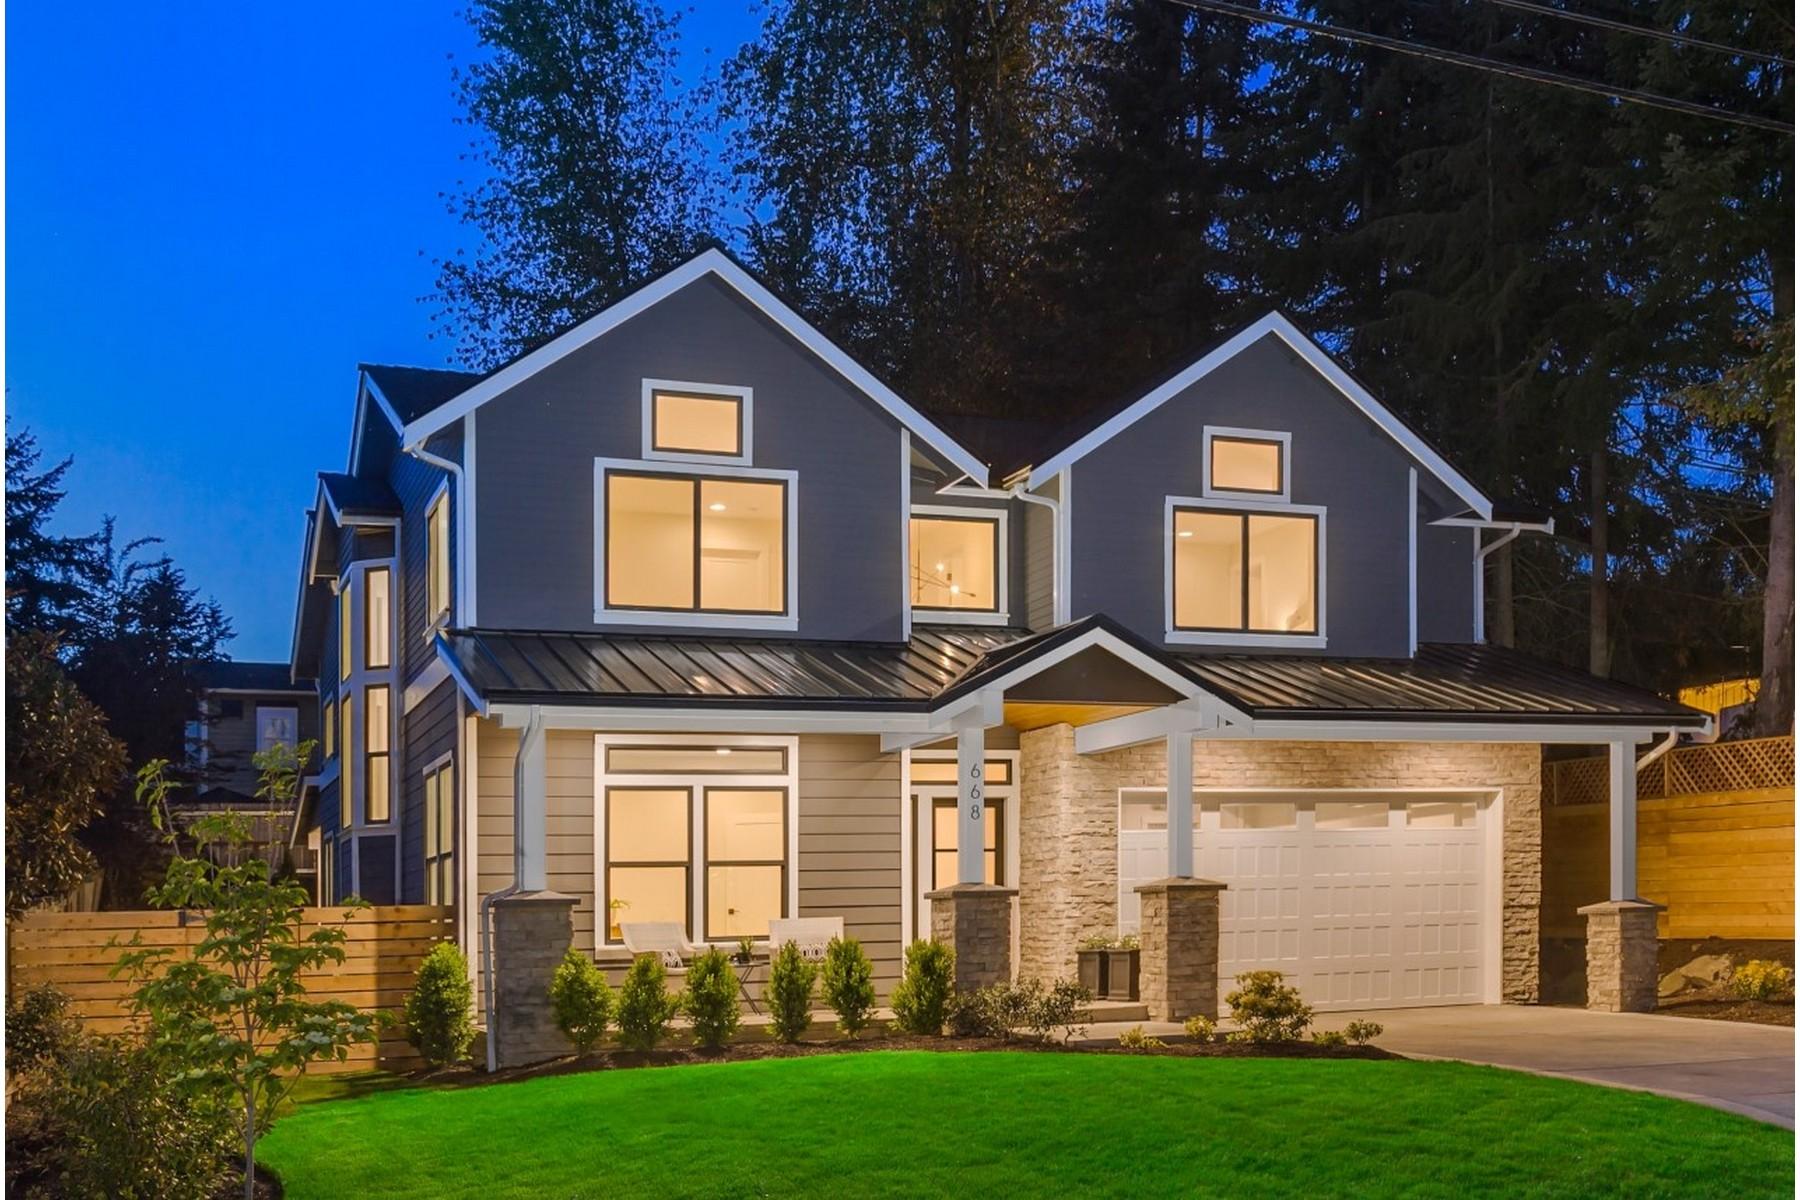 Single Family Home for Sale at East of Market Custom 668 10th Ave Kirkland, Washington, 98033 United States